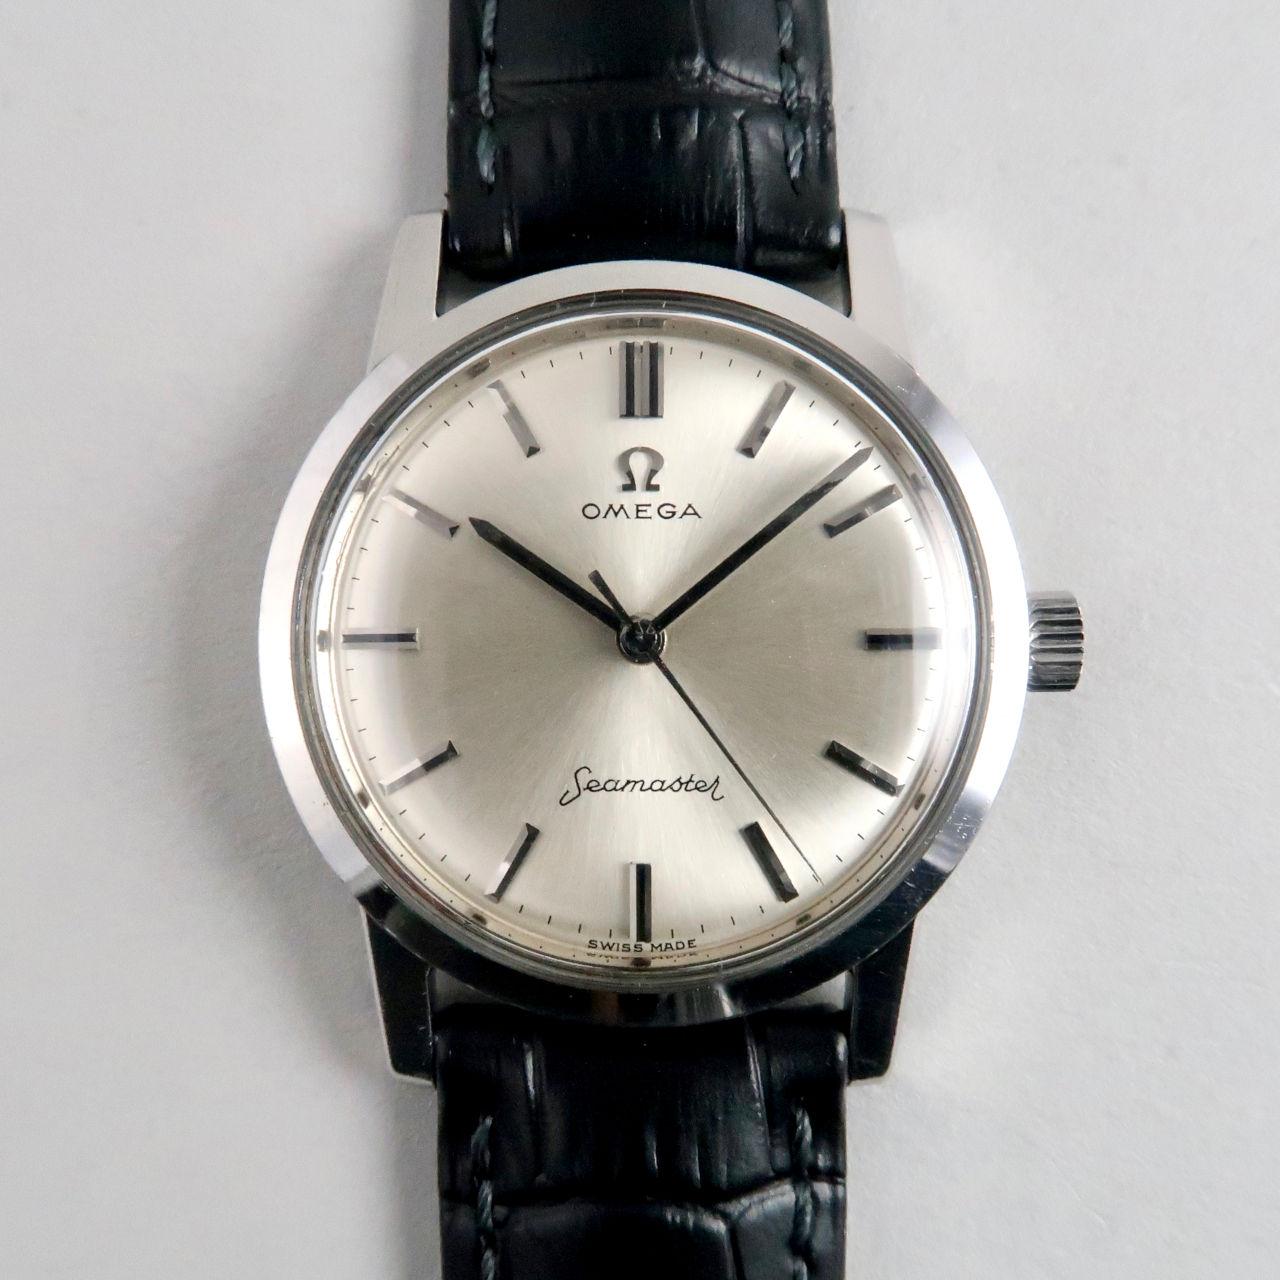 Omega Seamaster Ref. 14759 SC -62 steel vintage wristwatch, circa 1962